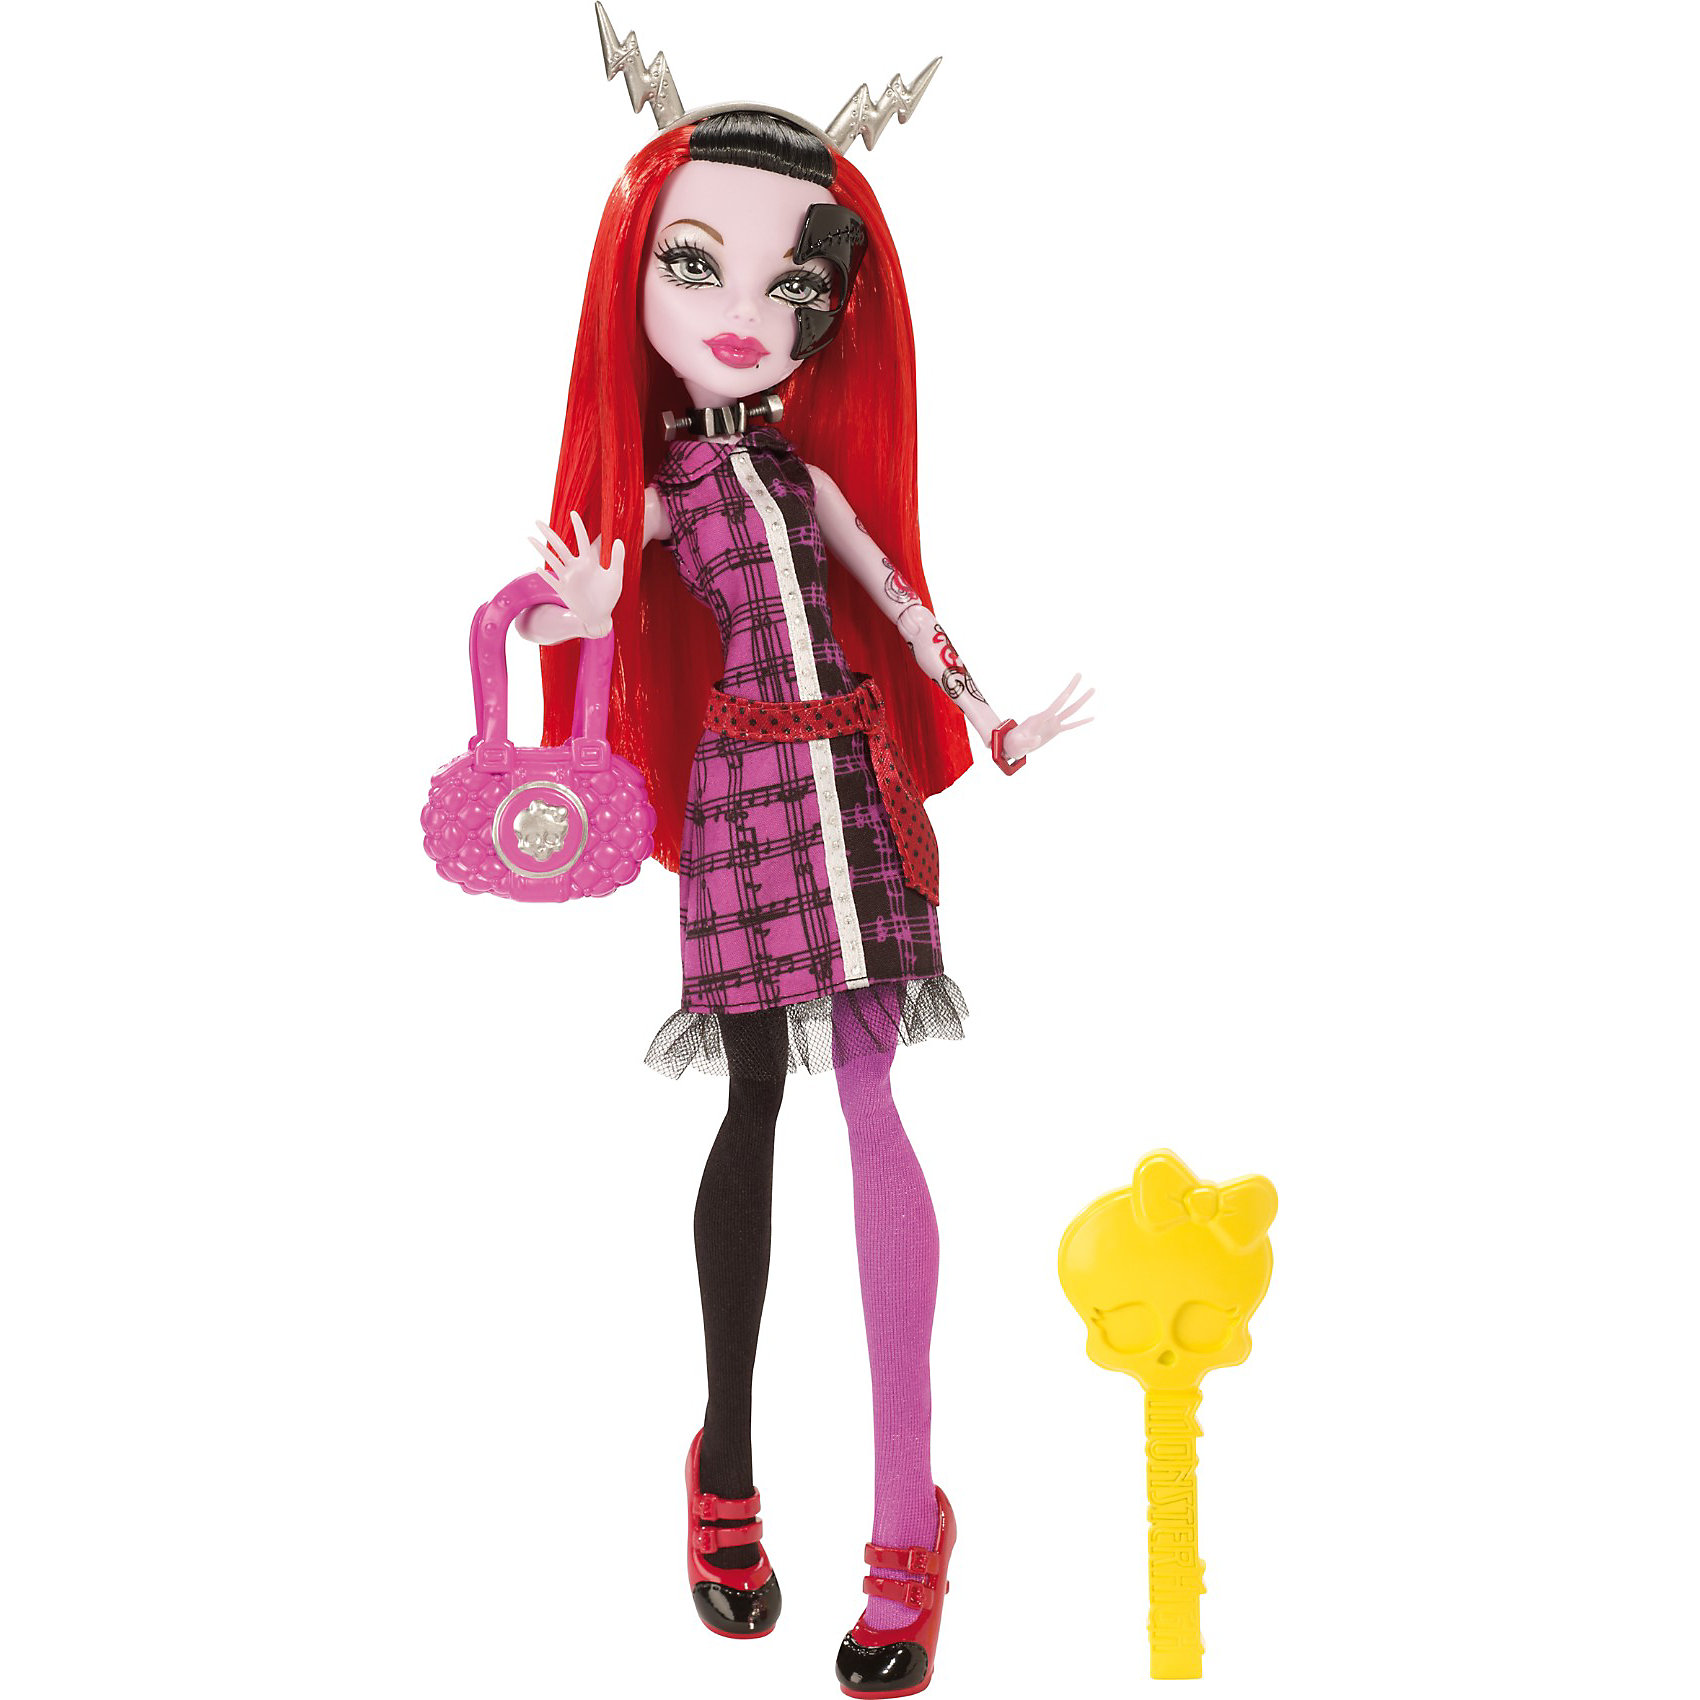 Кукла Оперетта Базовые персонажи Fatale Fusion, Monster High